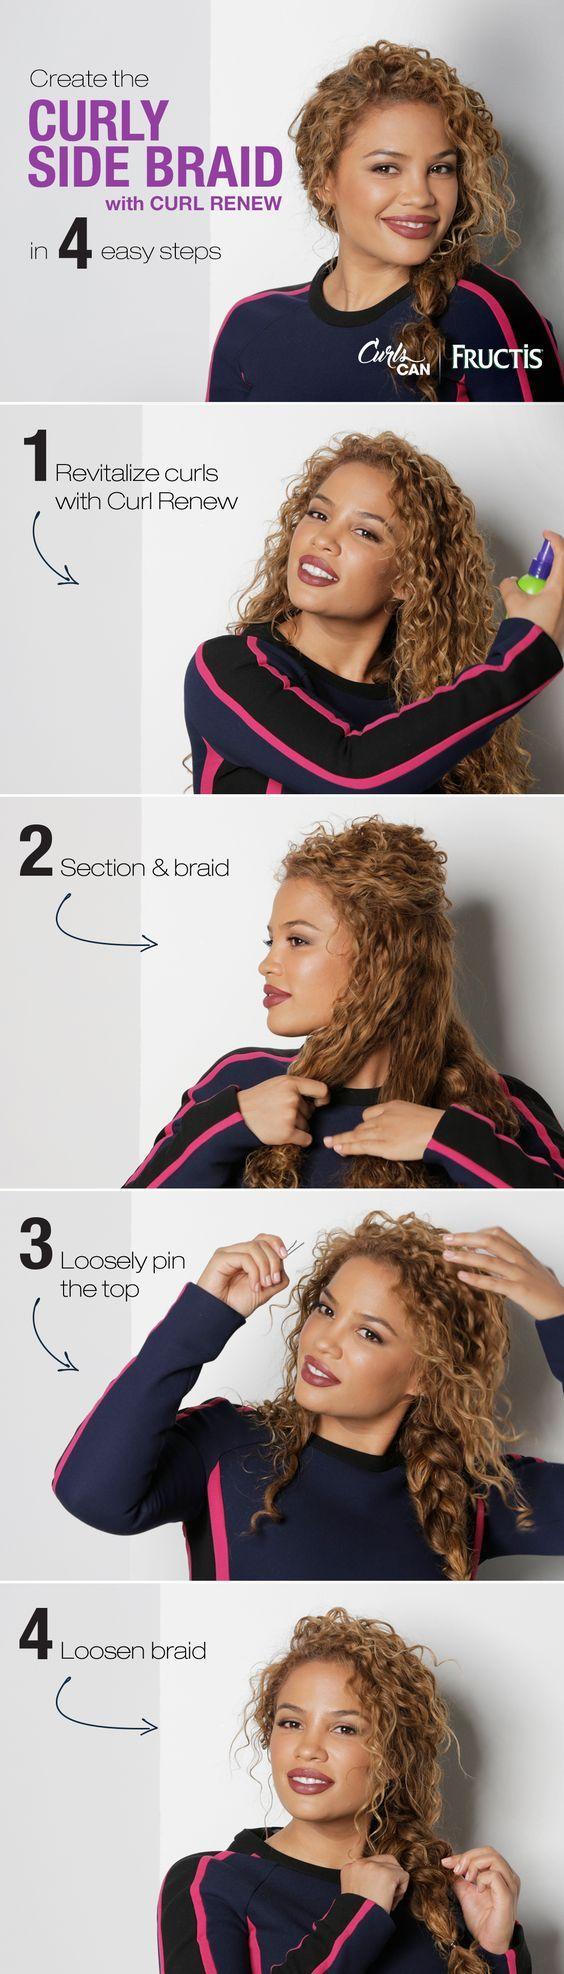 12 cute hairstyle ideas for medium-length hair - BrightSide